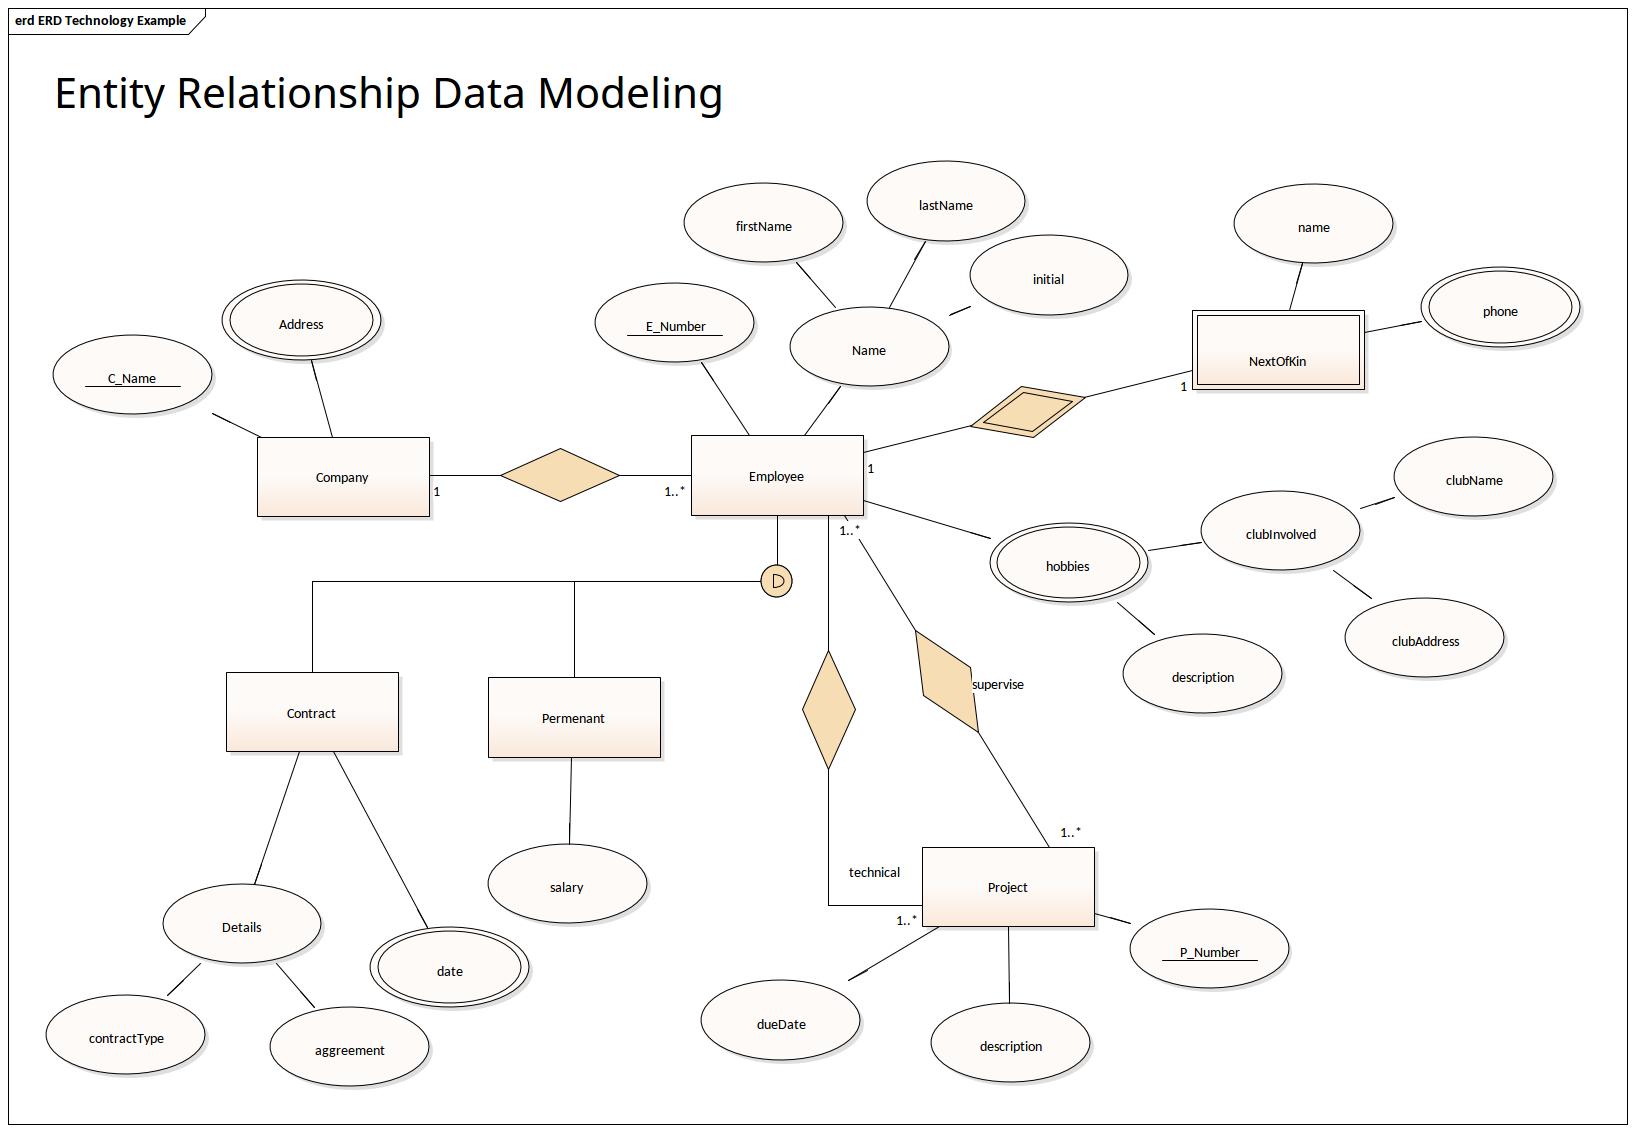 Entity Relationship Data Modeling   Enterprise Architect with regard to The Entity Relationship Model